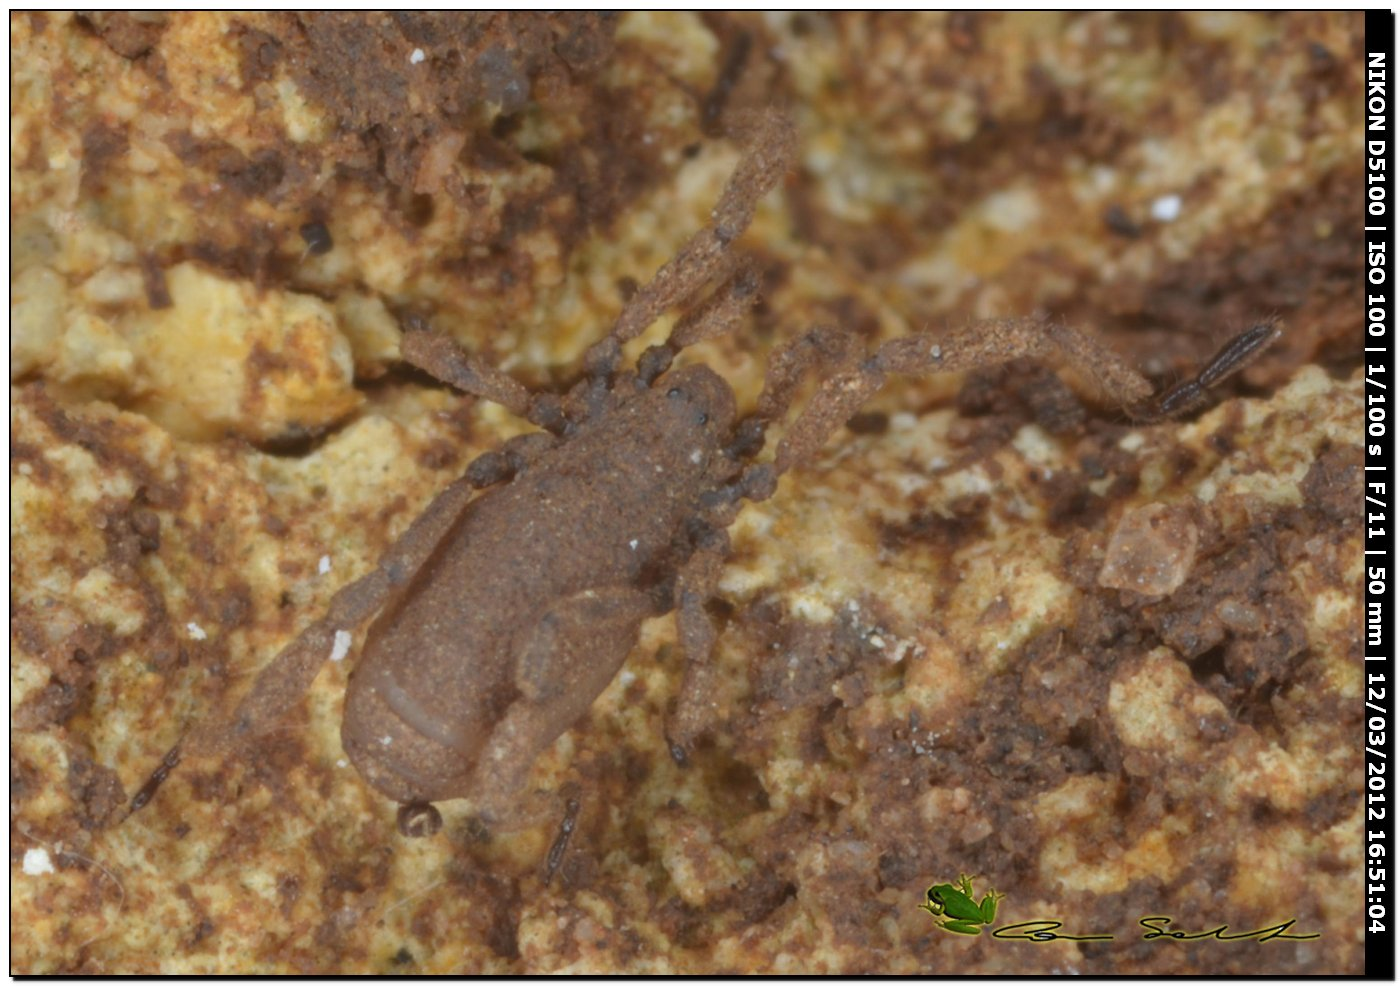 Anelasmocephalus brignolii da Usini - No 44